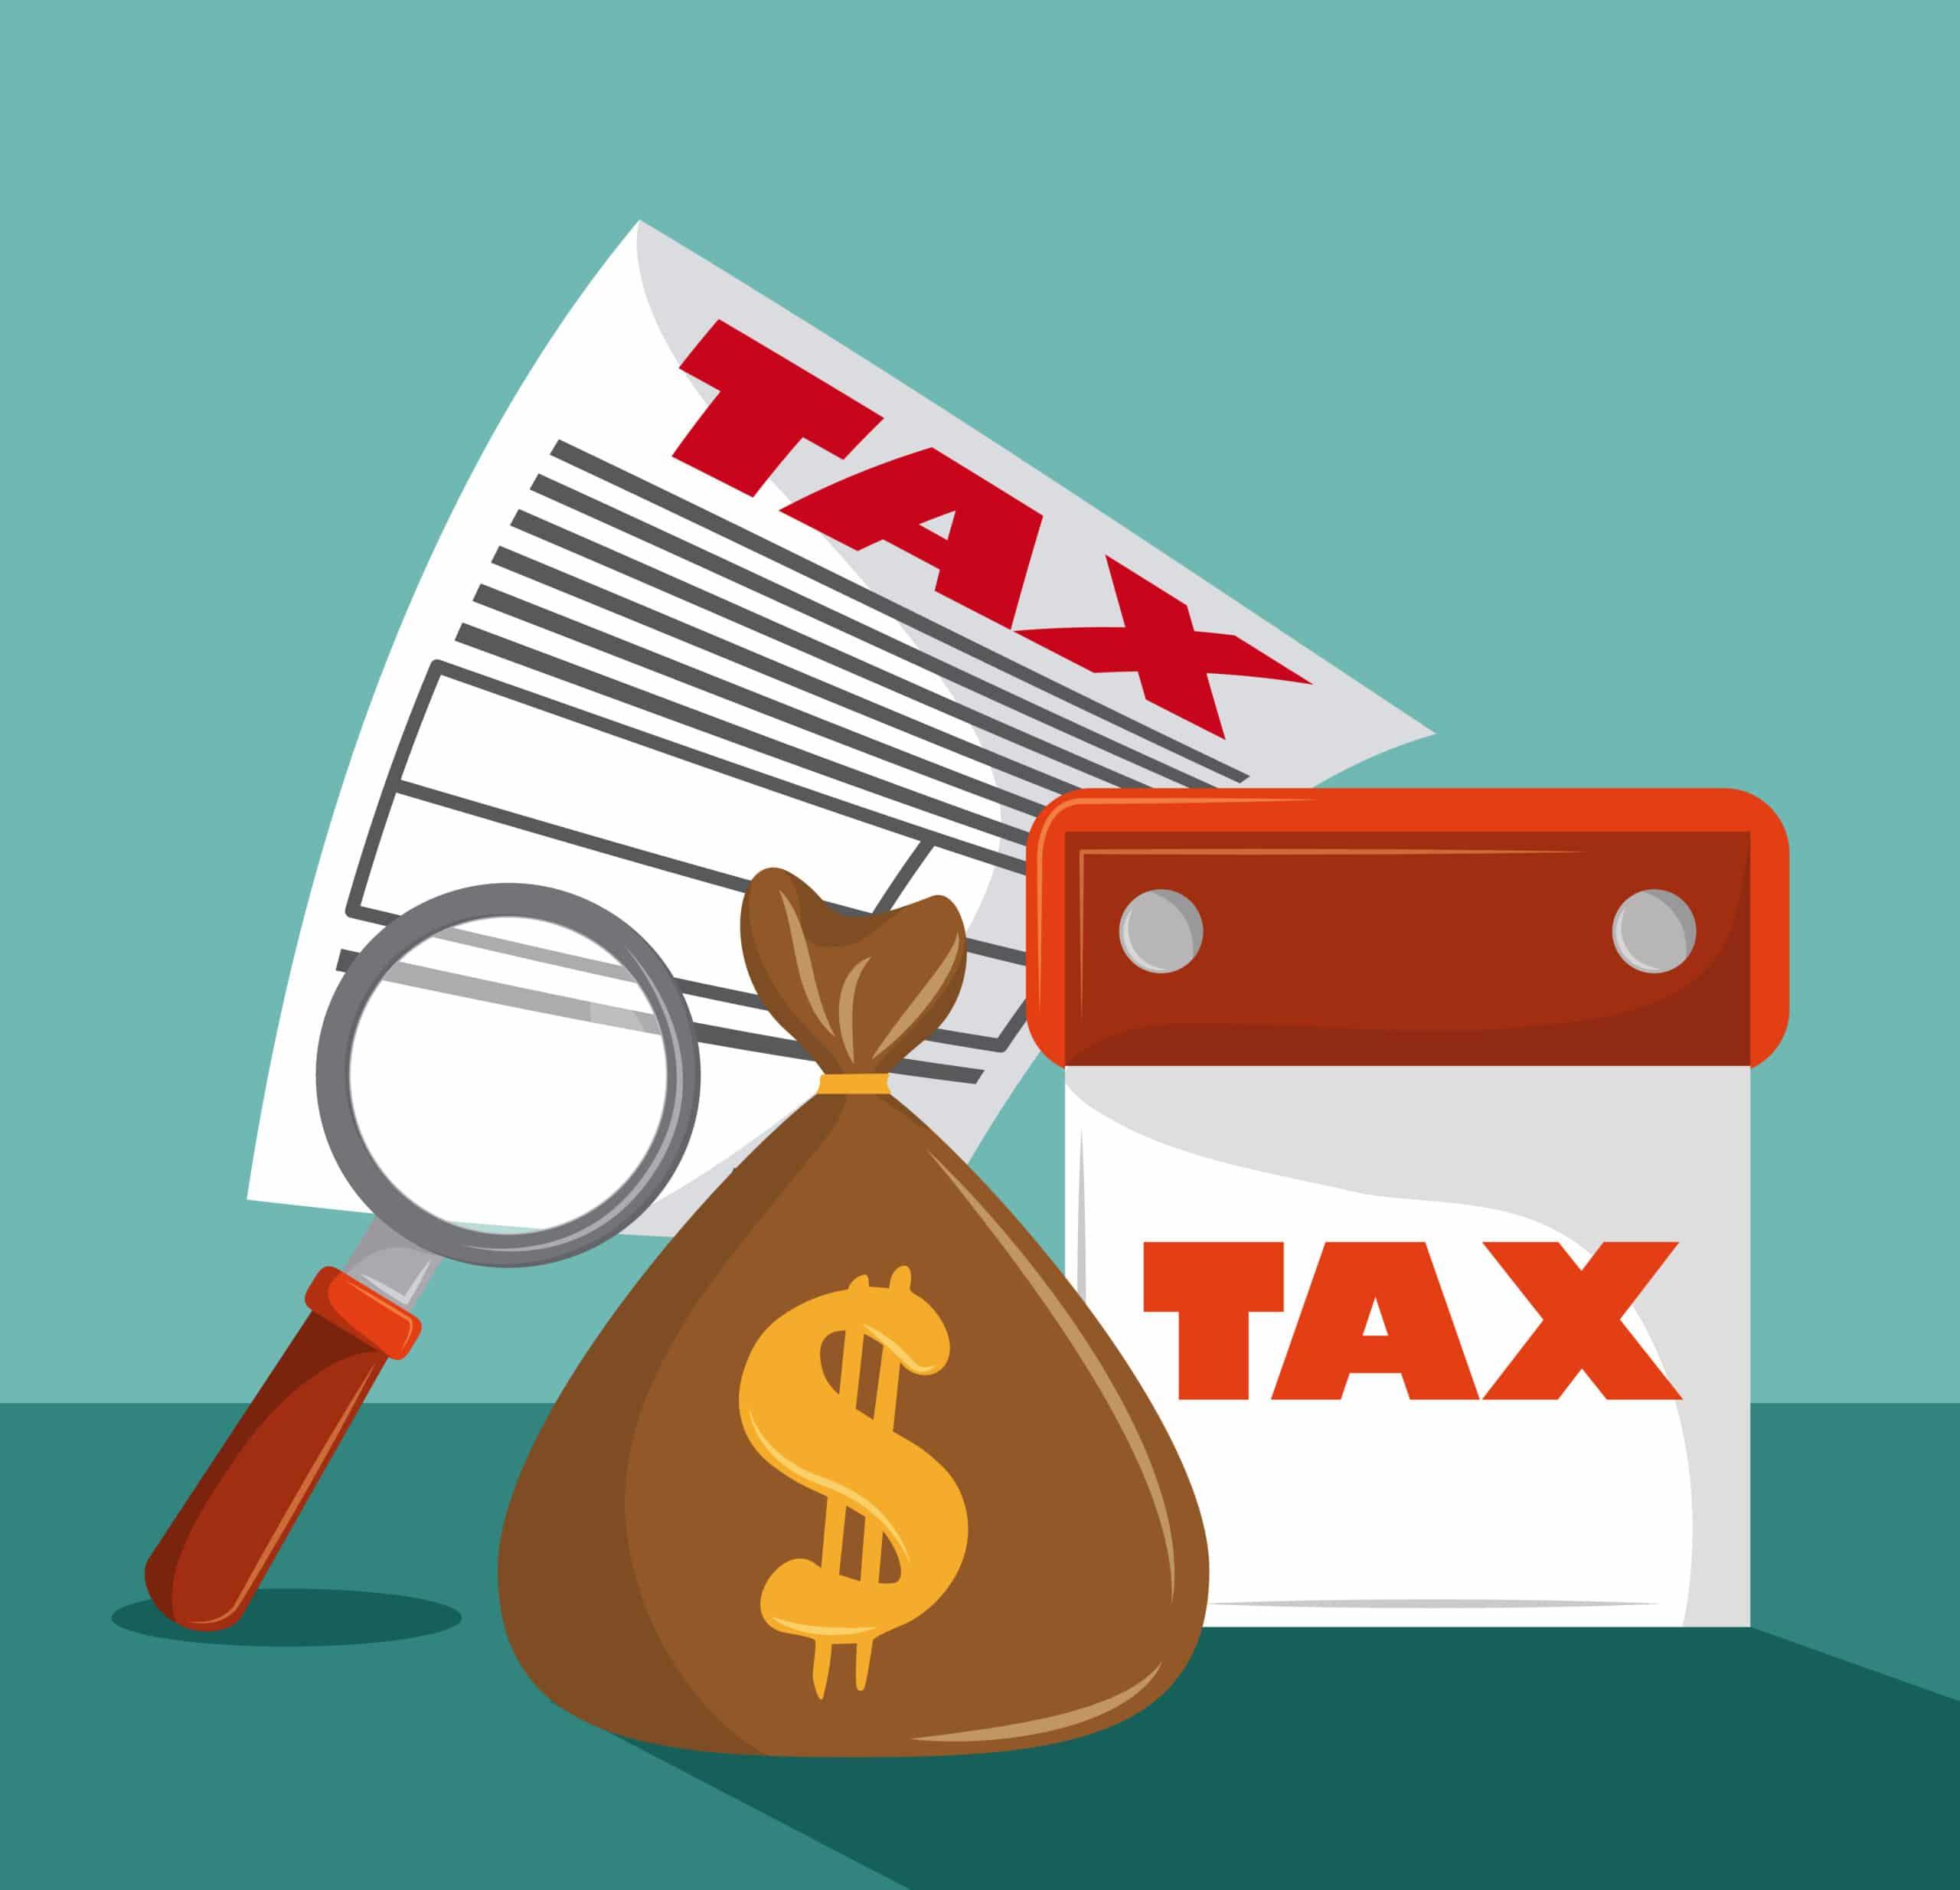 UBIT tax due illustration